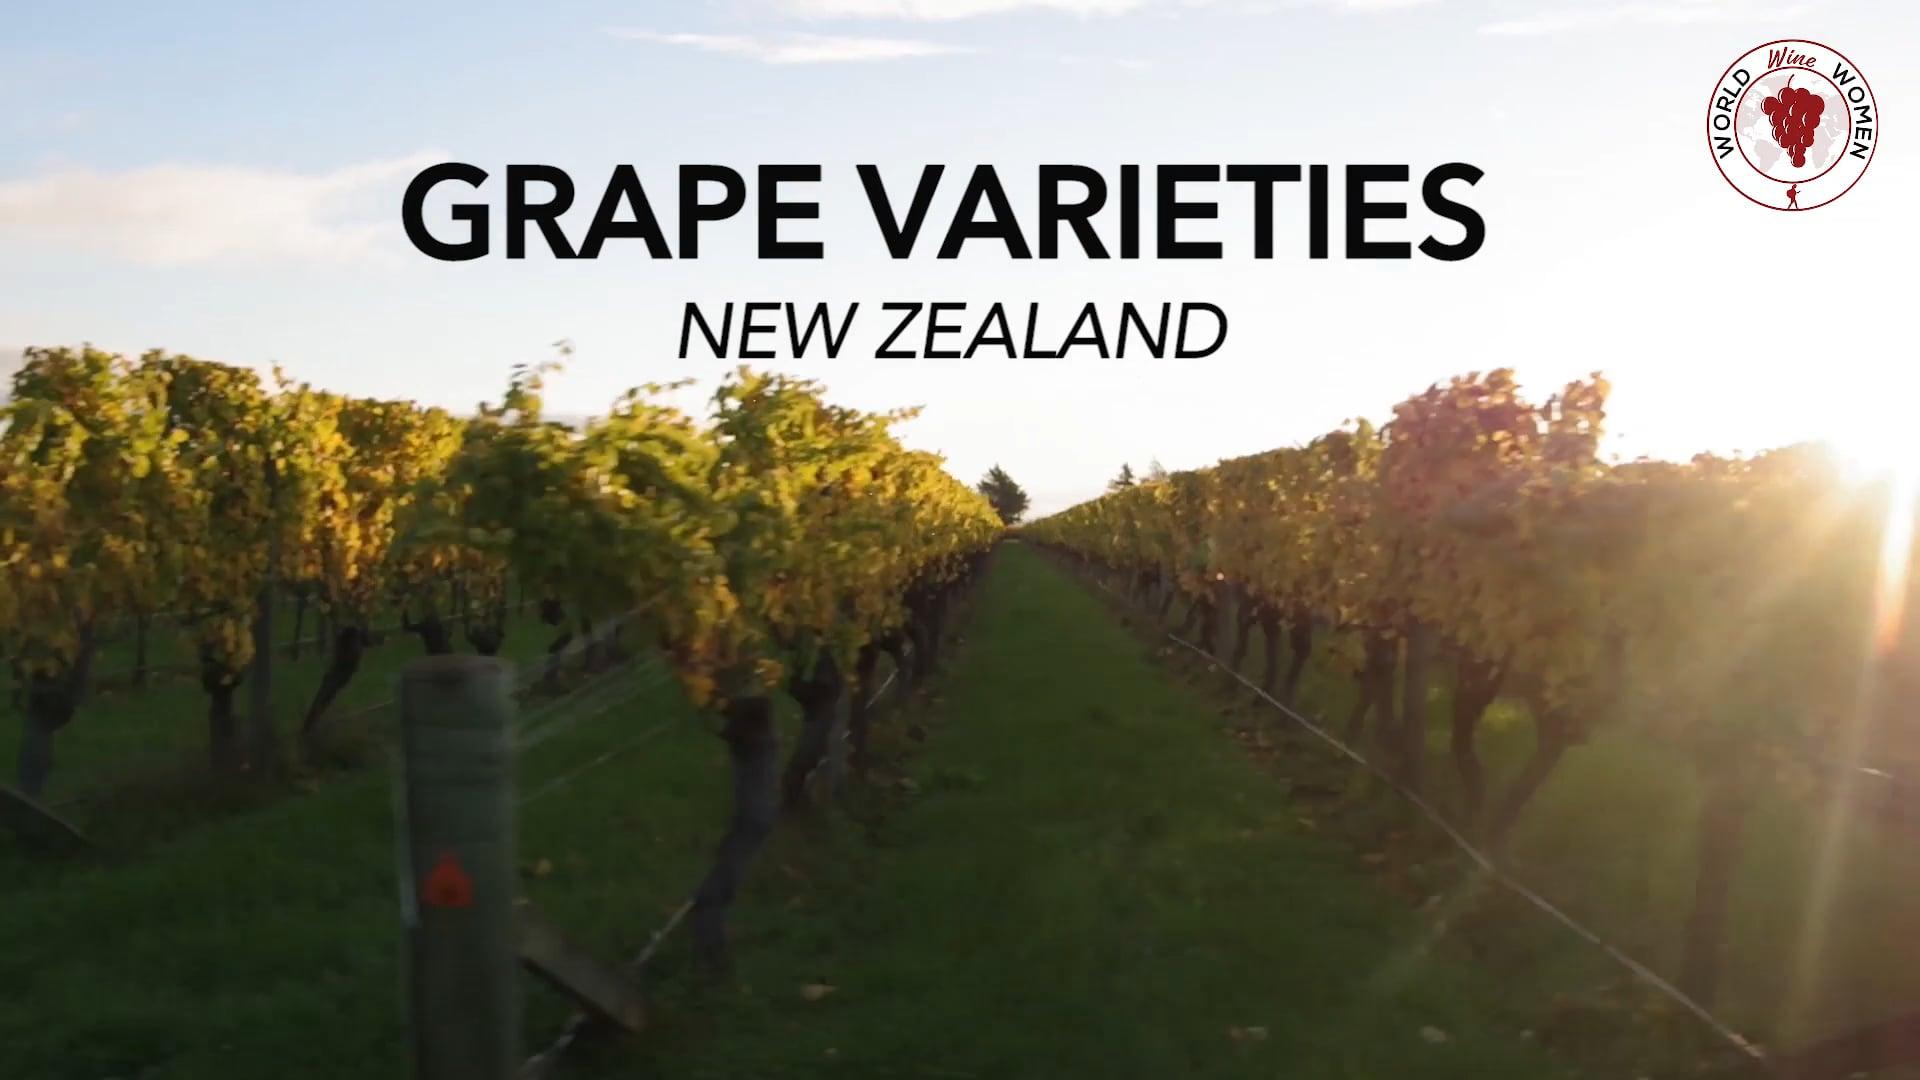 Grape varieties - New Zealand